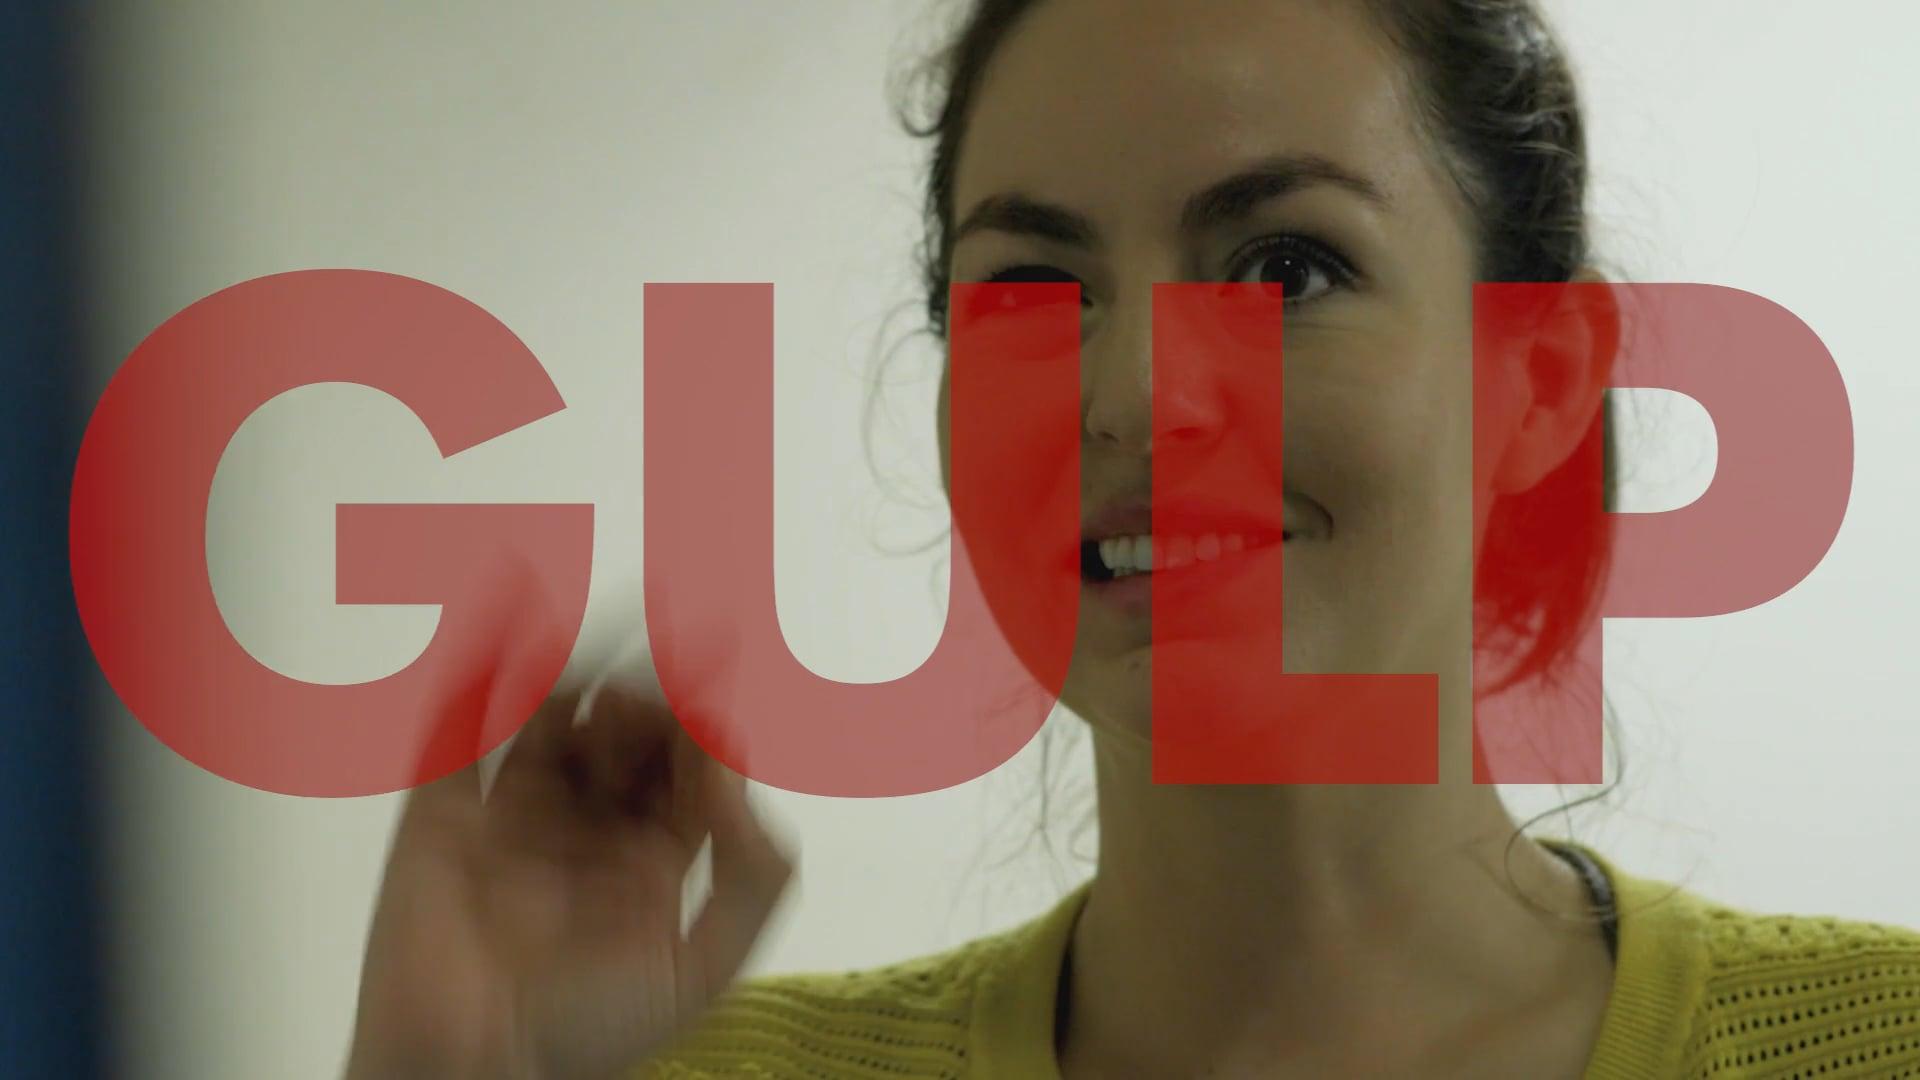 GULP: A Short Film (Trailer)